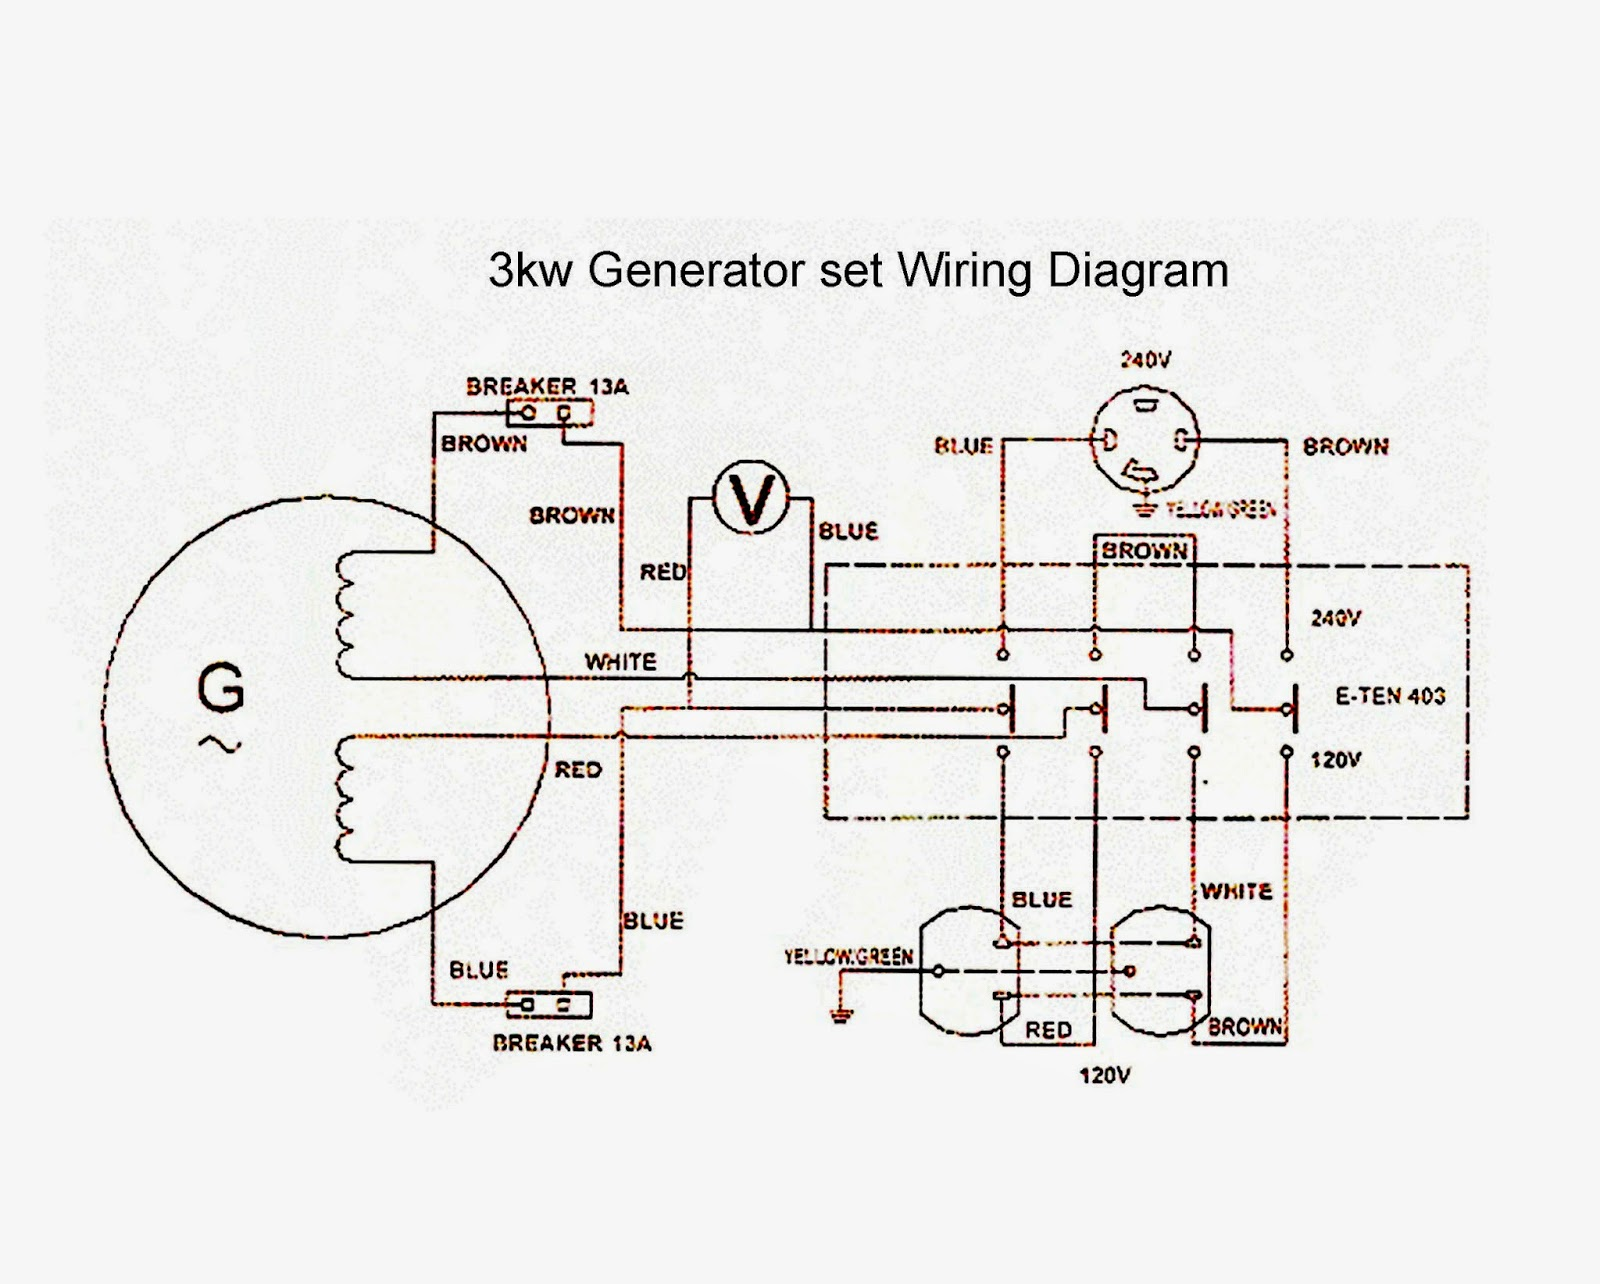 Miraculous Generator Wiring Schematic Model A Wiring Diagram Wiring Cloud Orsalboapumohammedshrineorg